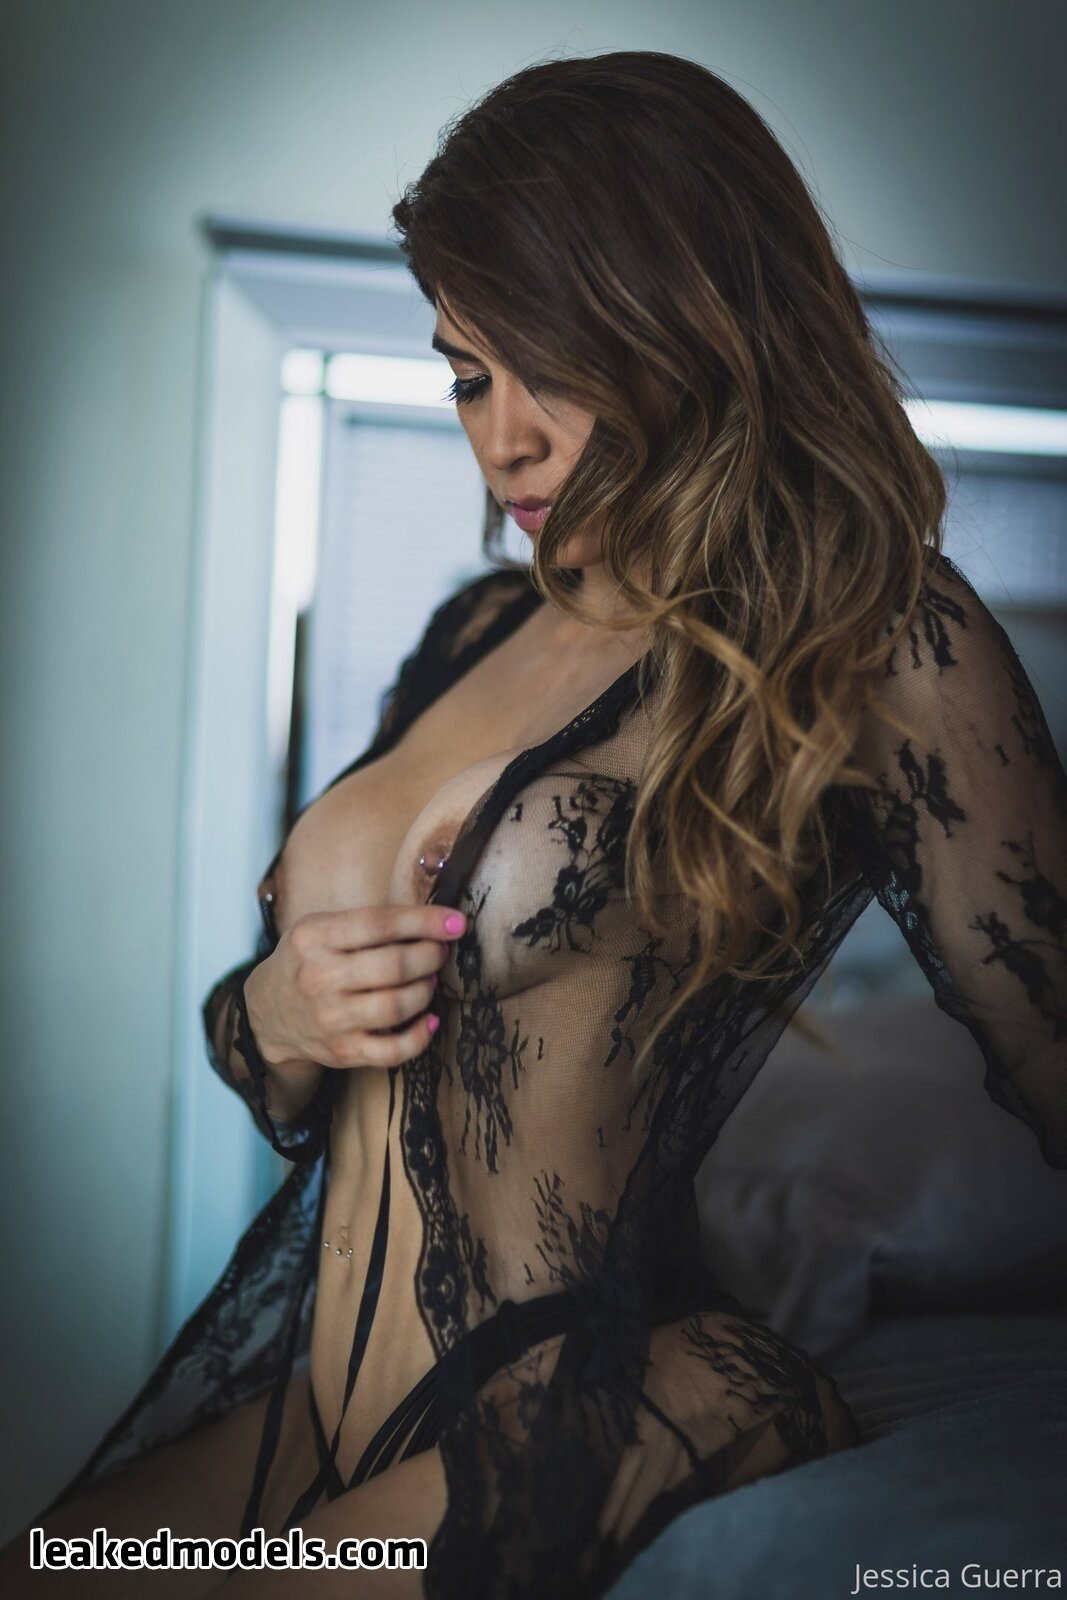 Jessica Guerra – jessicaguerra OnlyFans Nude Leaks (27 Photos)